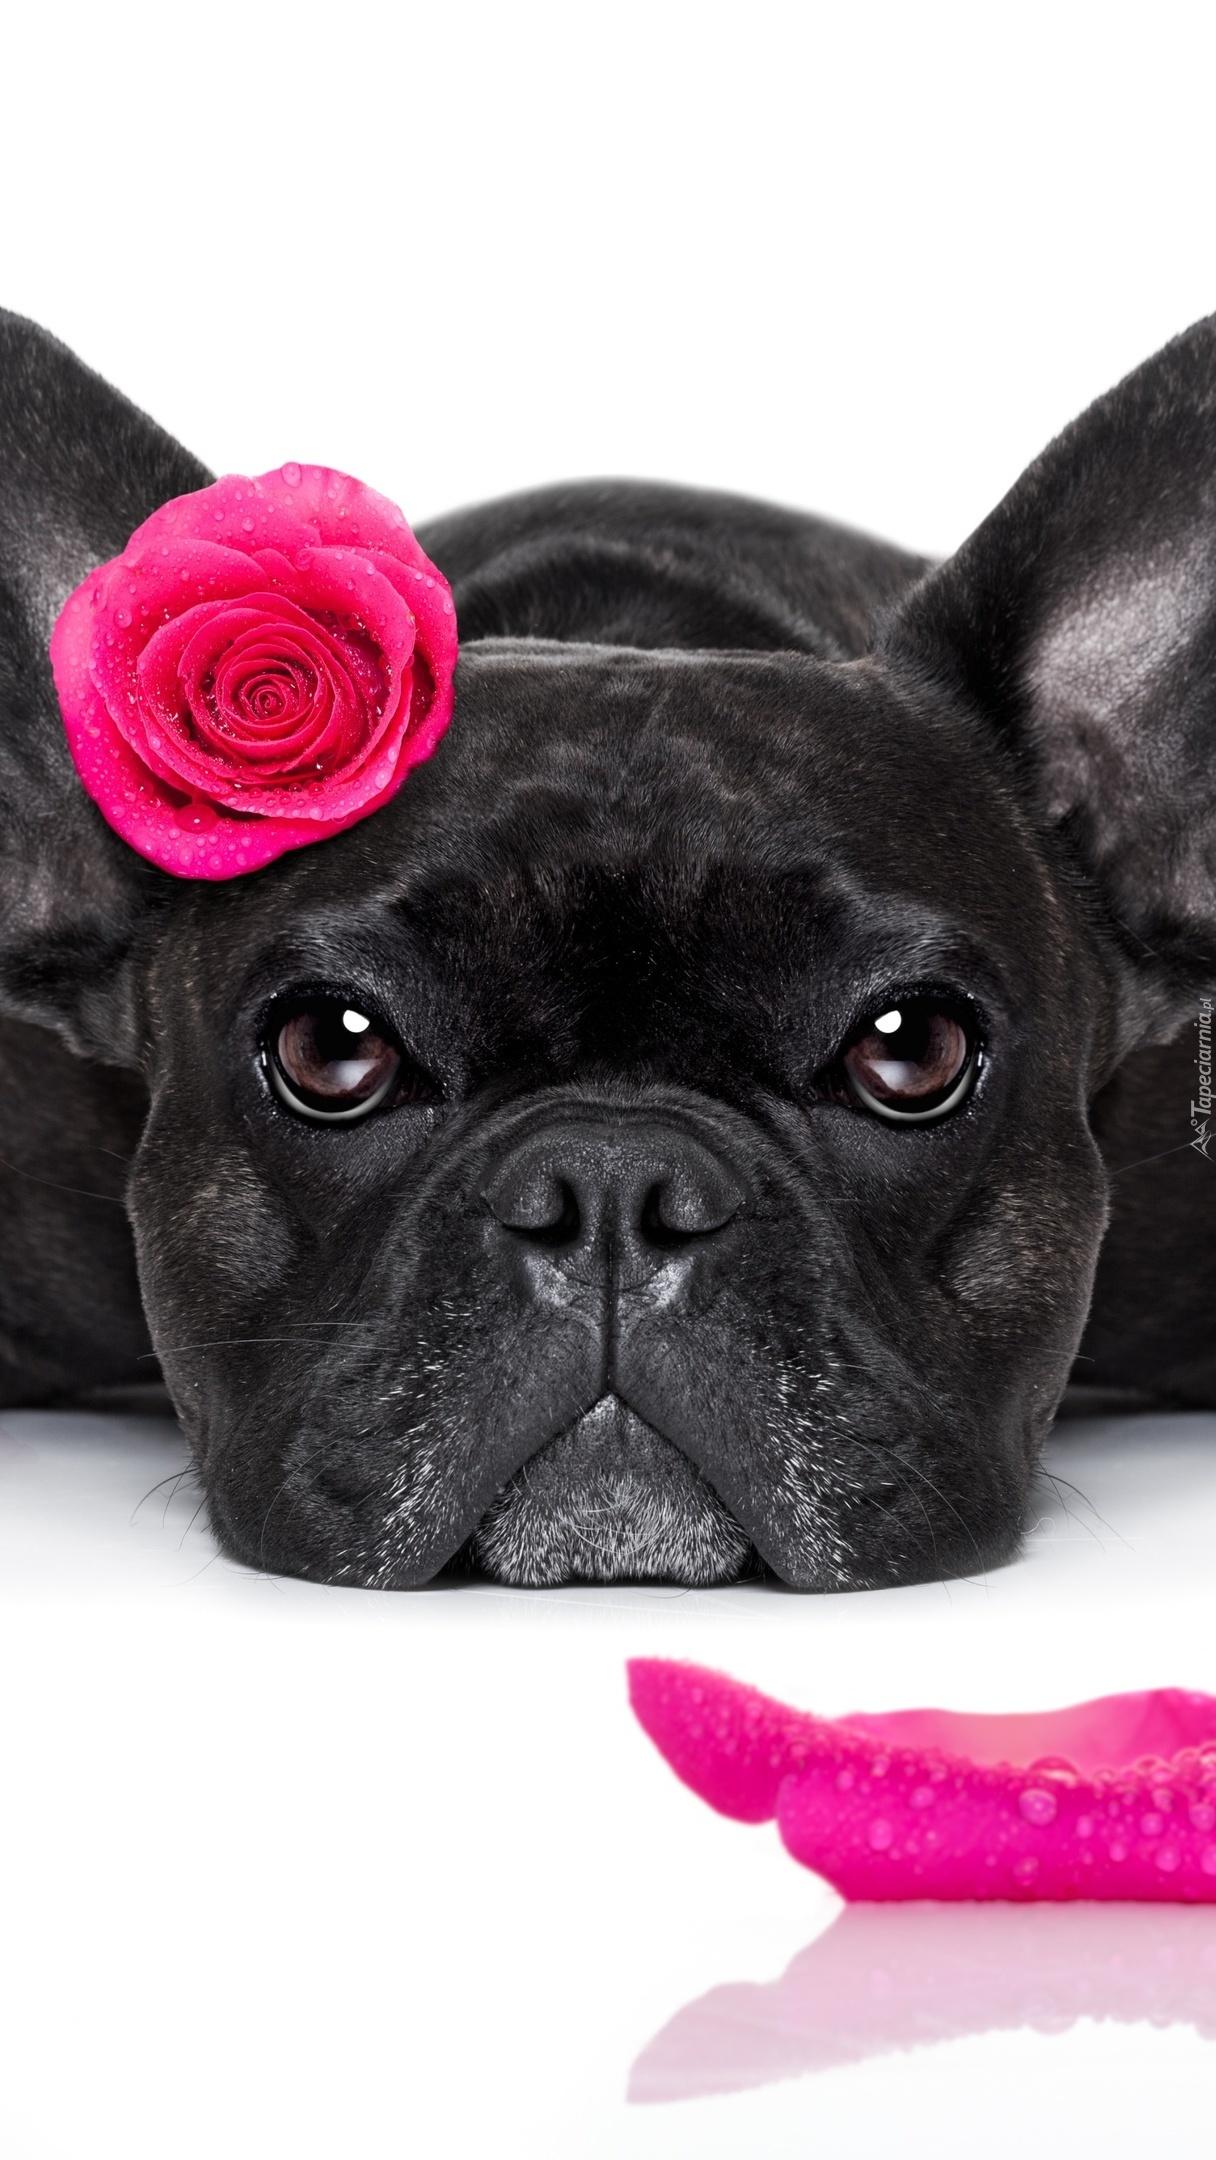 Buldog francuski z różą